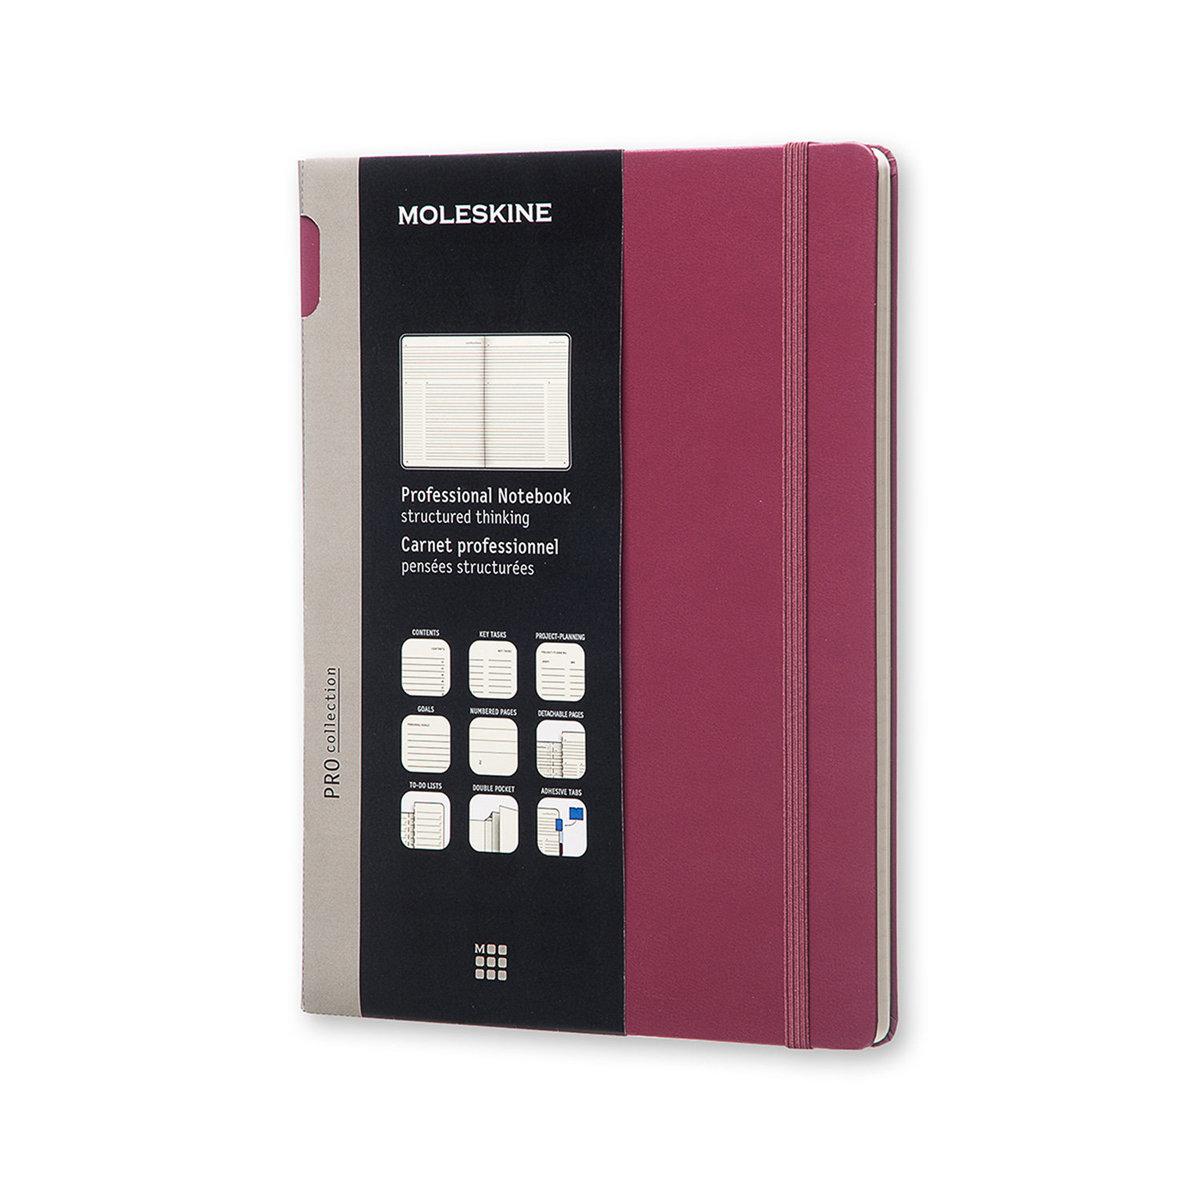 Moleskine PROFESSIONAL NOTEBOOK XL Plum Purple HARD COVER